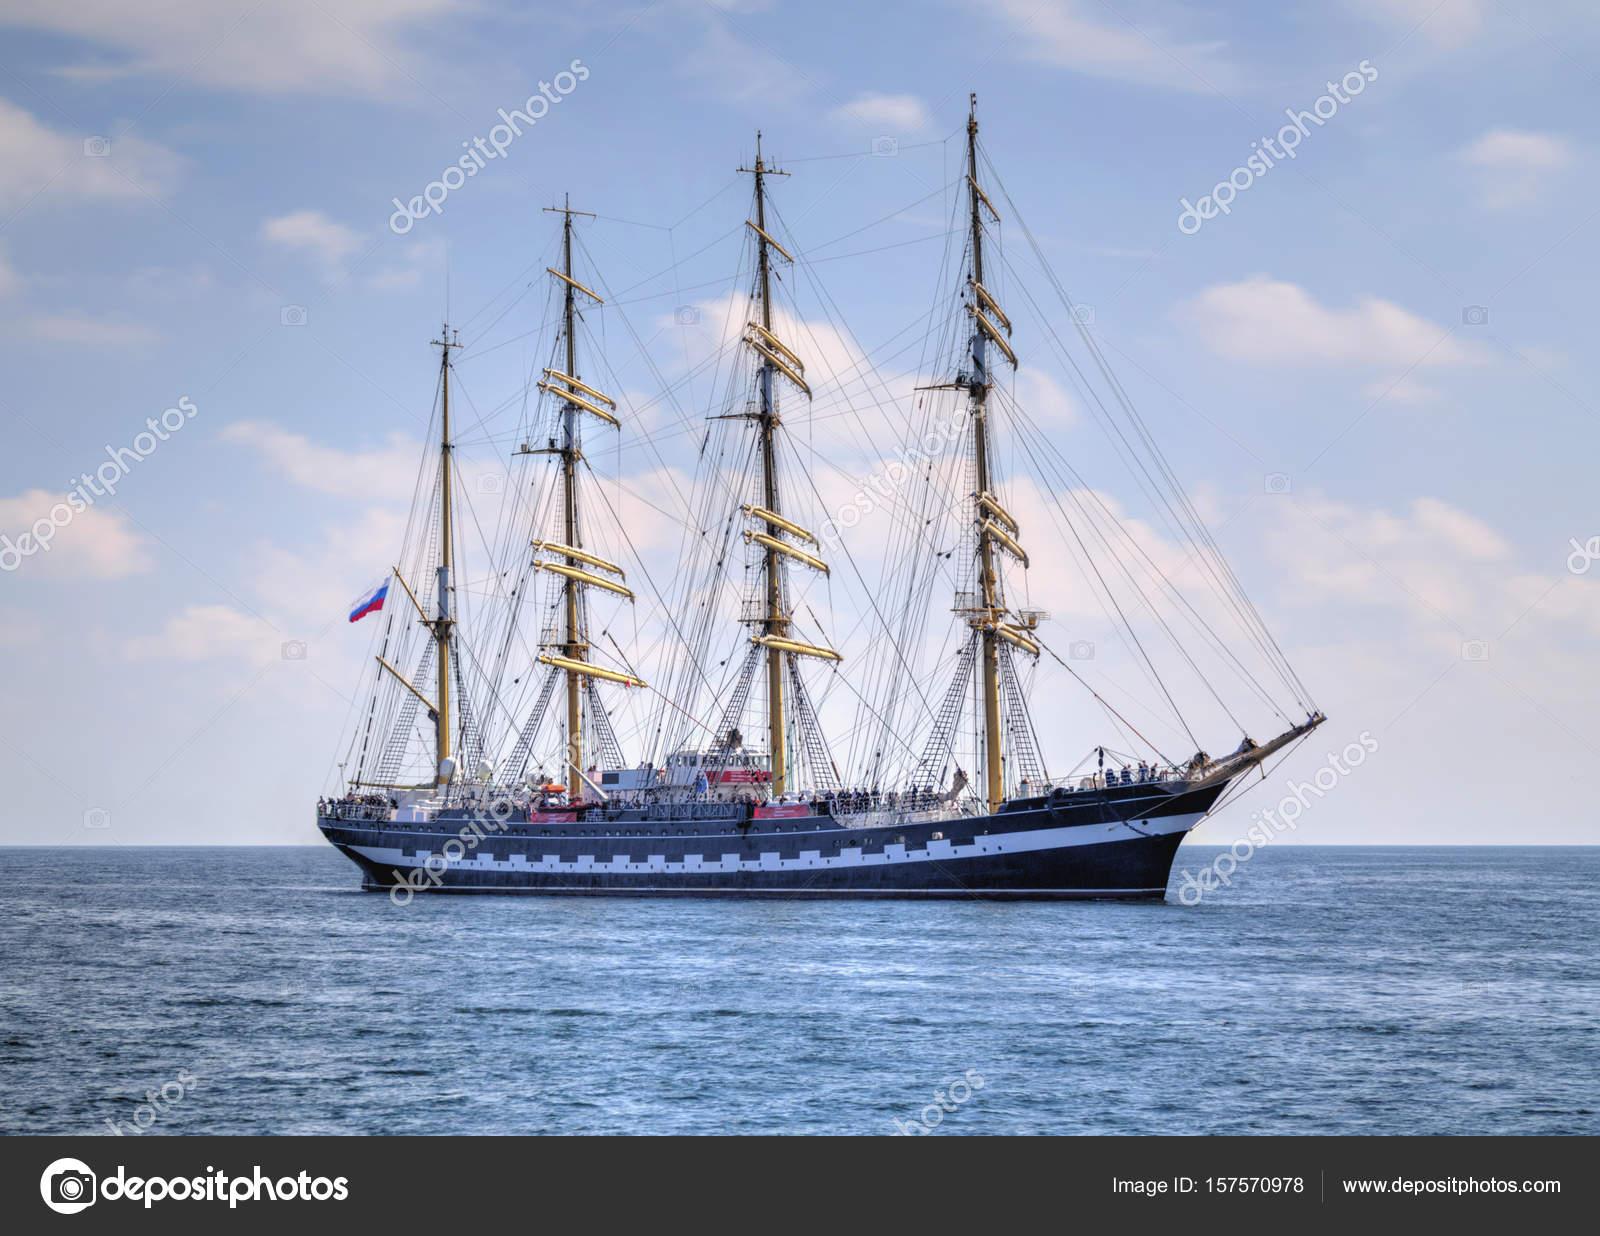 Segelschiffe auf dem meer  Segelschiff im Meer — Stockfoto © phadventureBG #157570978